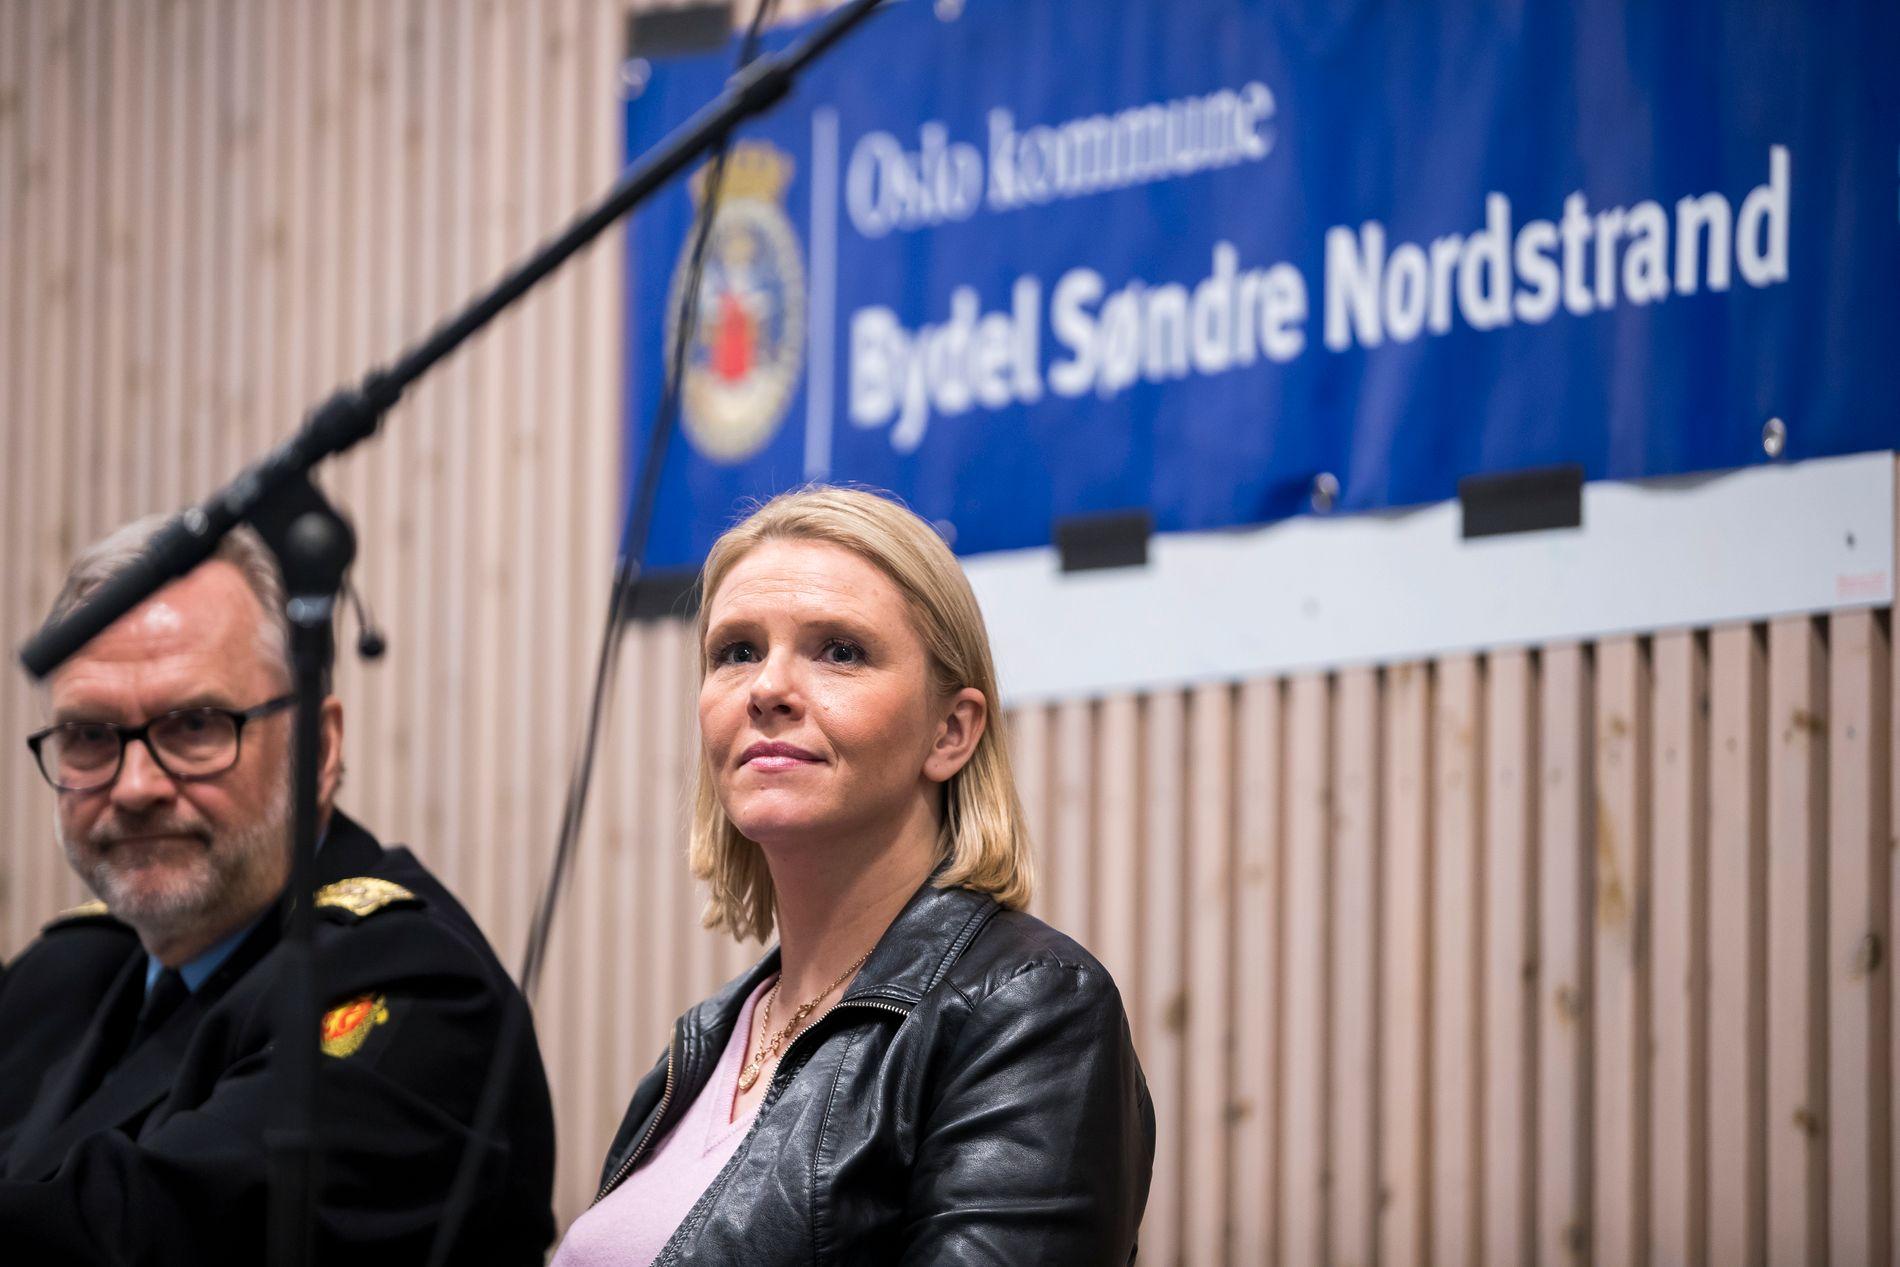 FOLKEMØTE: Sylvi Listhaug var på nyåret på et folkemøte på Holmlia sammen med politimester Hans Sverre Sjøvold. Der ble ikke Young Bloods nevnt ved navn.